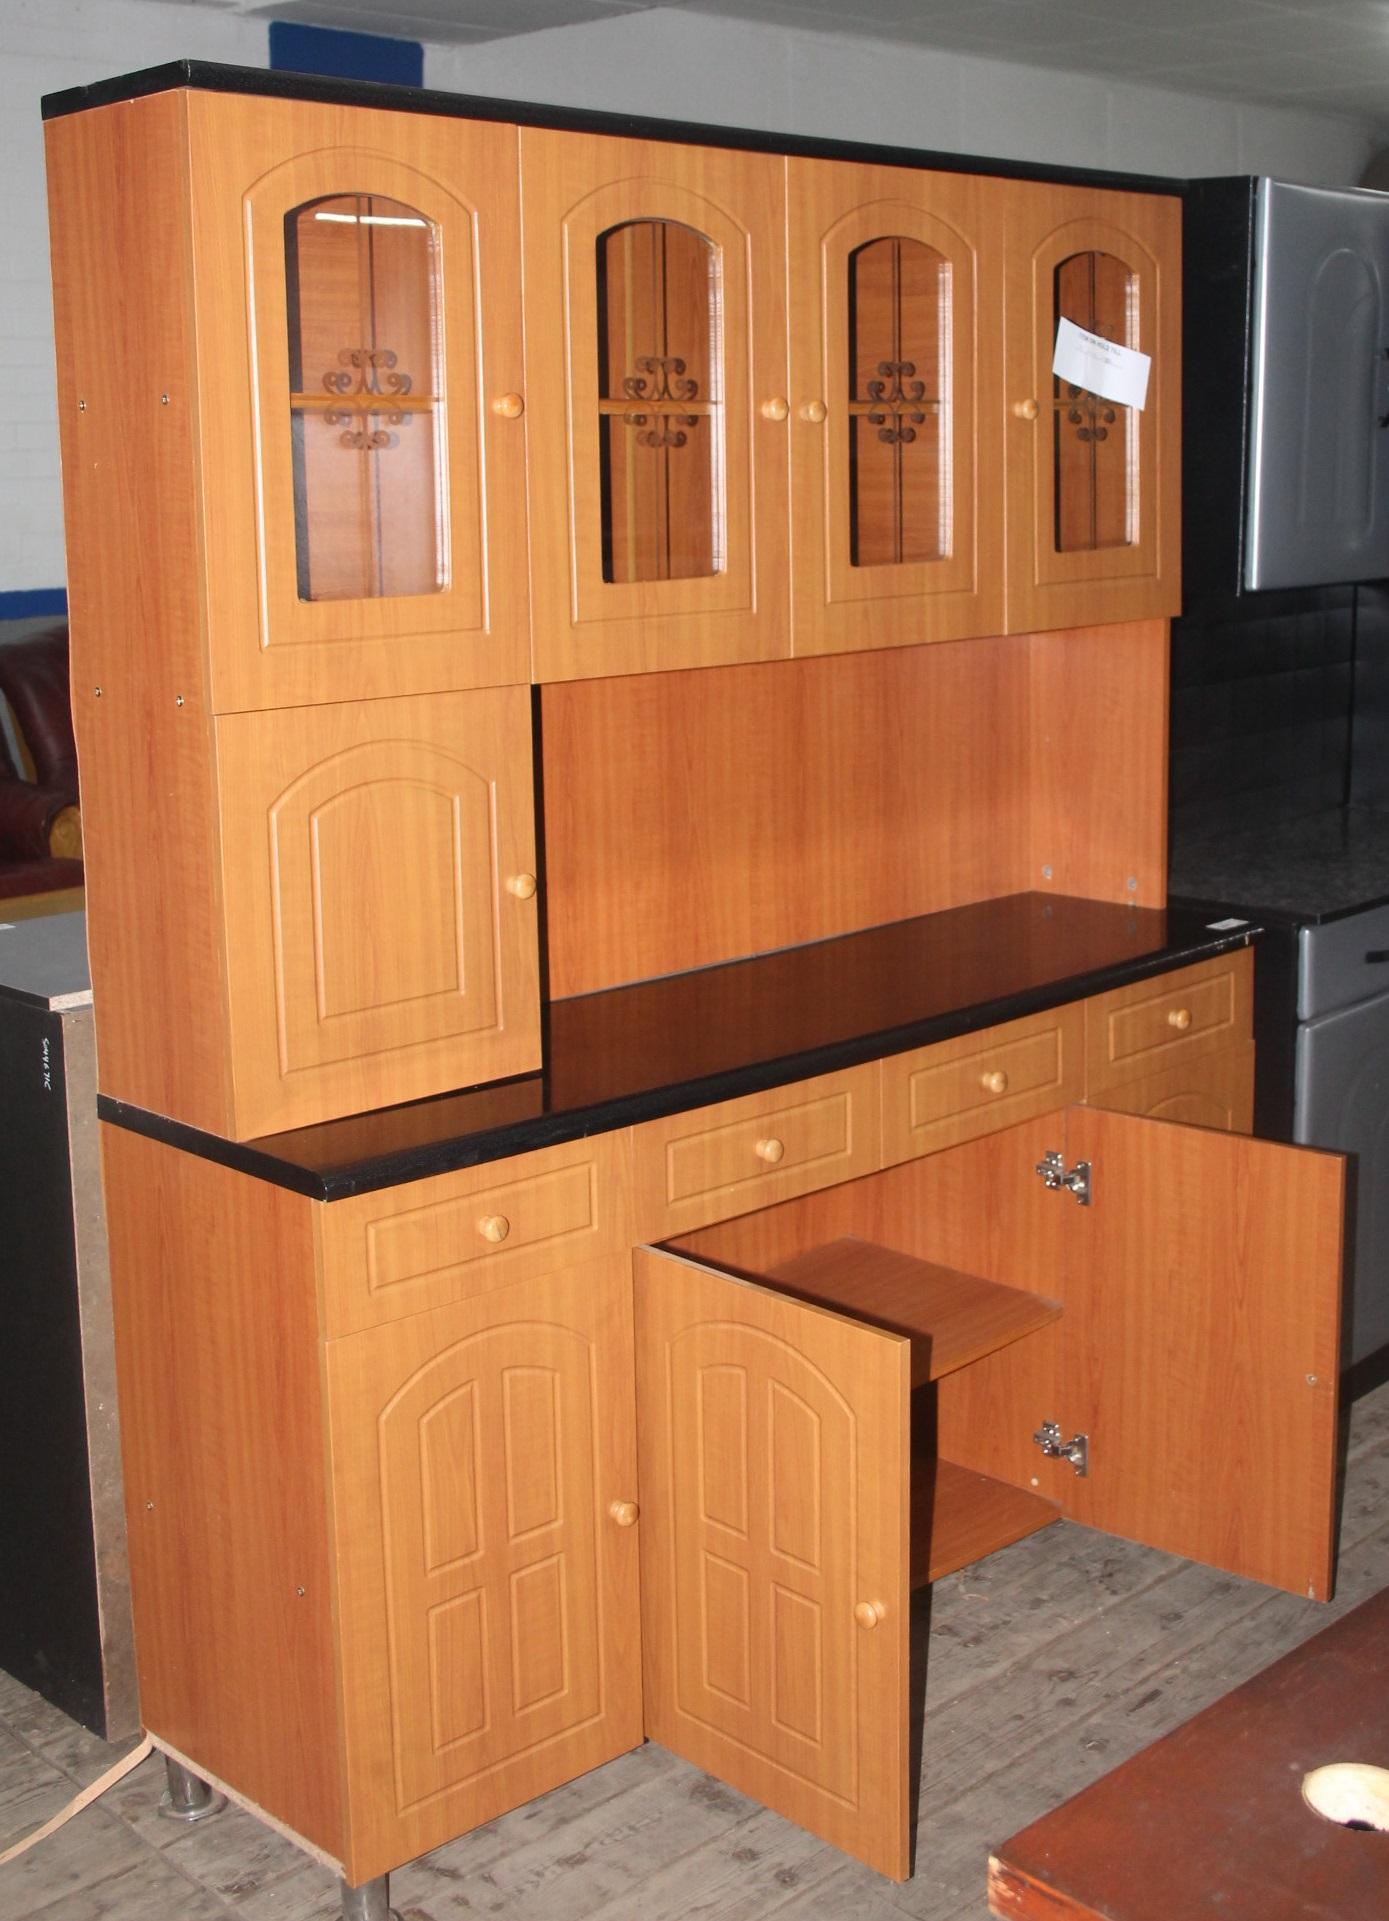 Brown kitchen cupboard S044826B #Rosettenvillepawnshop